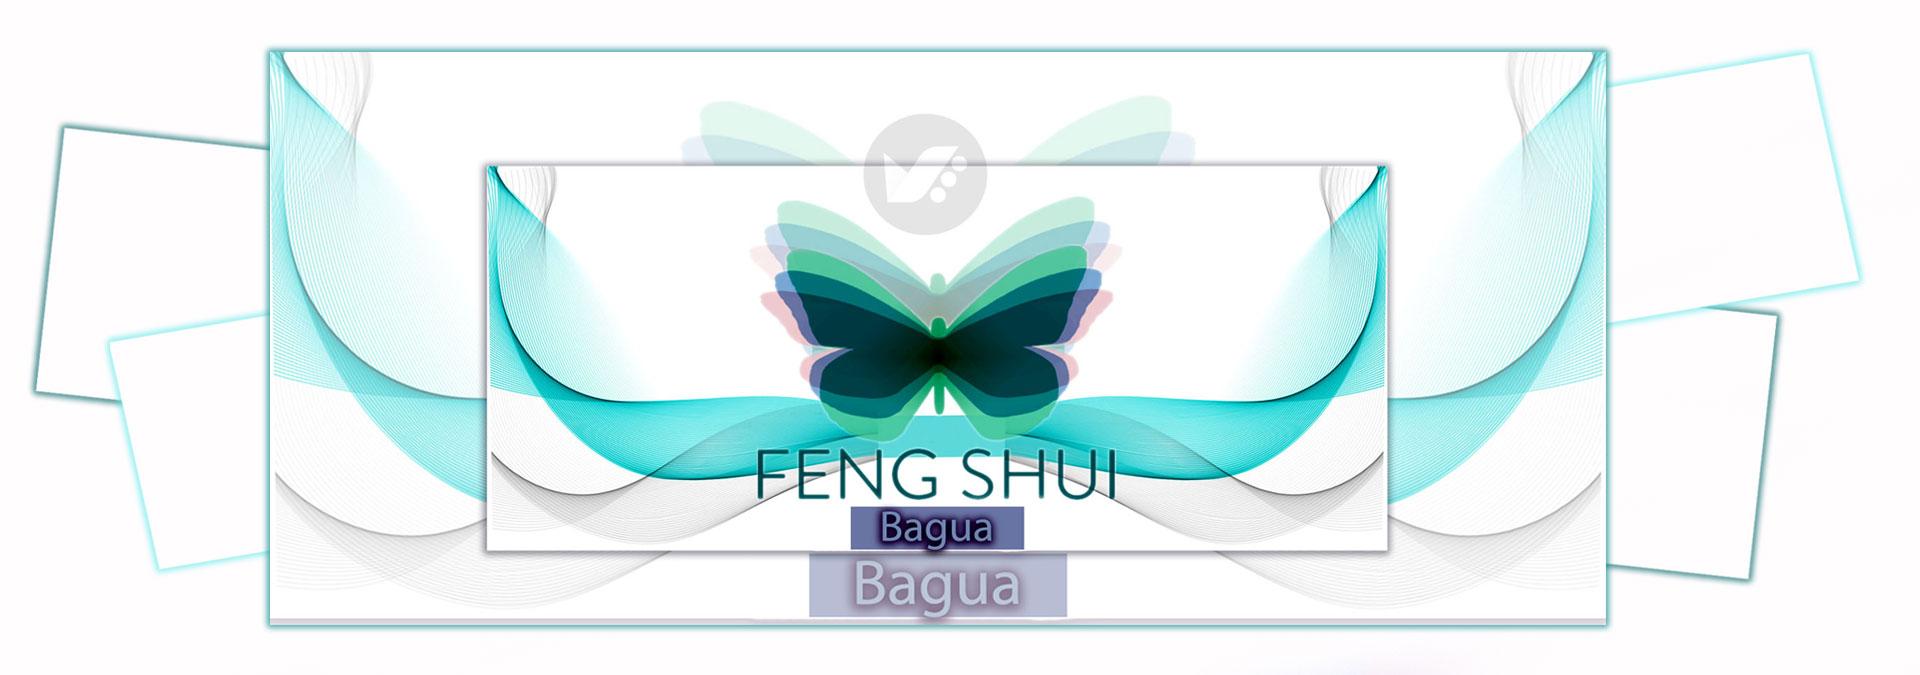 Bagua  Feng Shui H1 1 1 - نقشه باگوا